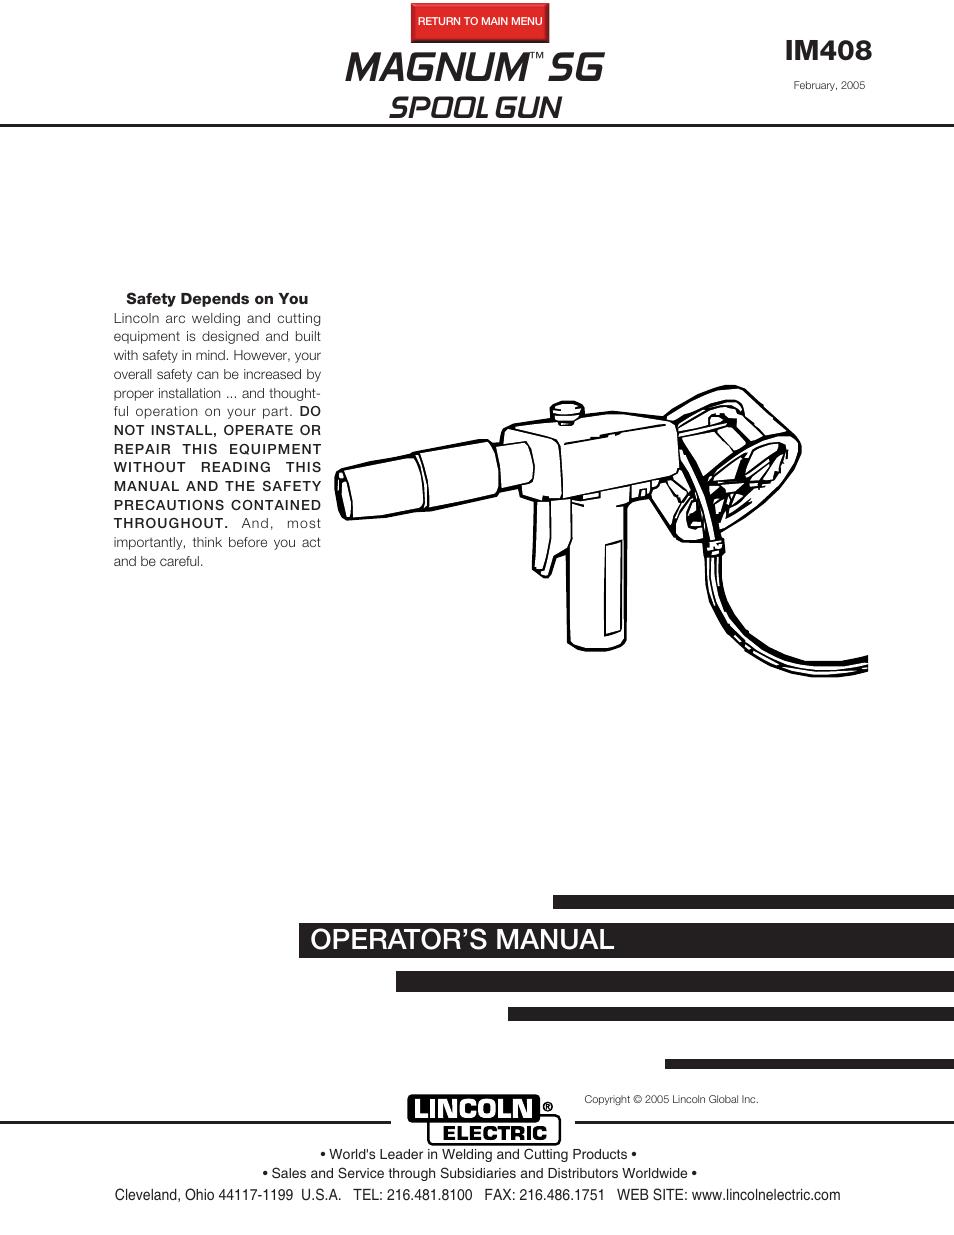 wiring diagram lincoln spool gun